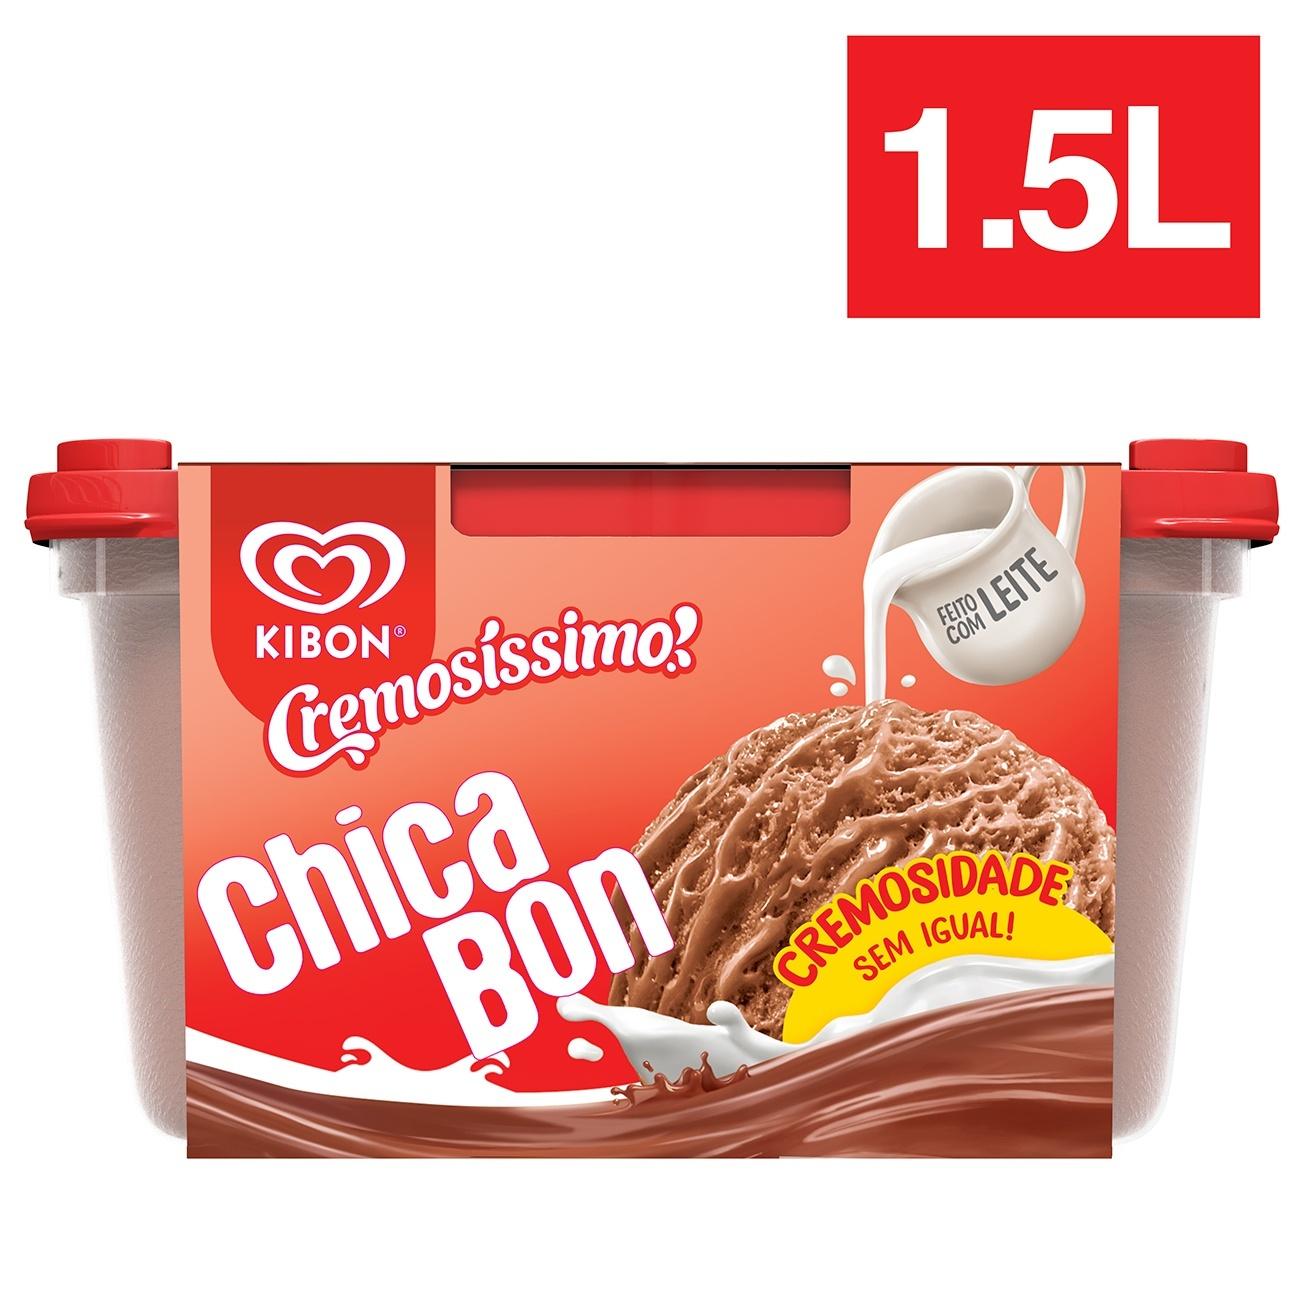 Sorvete Pote Kibon Cremosíssimo Chicabon 1,5L